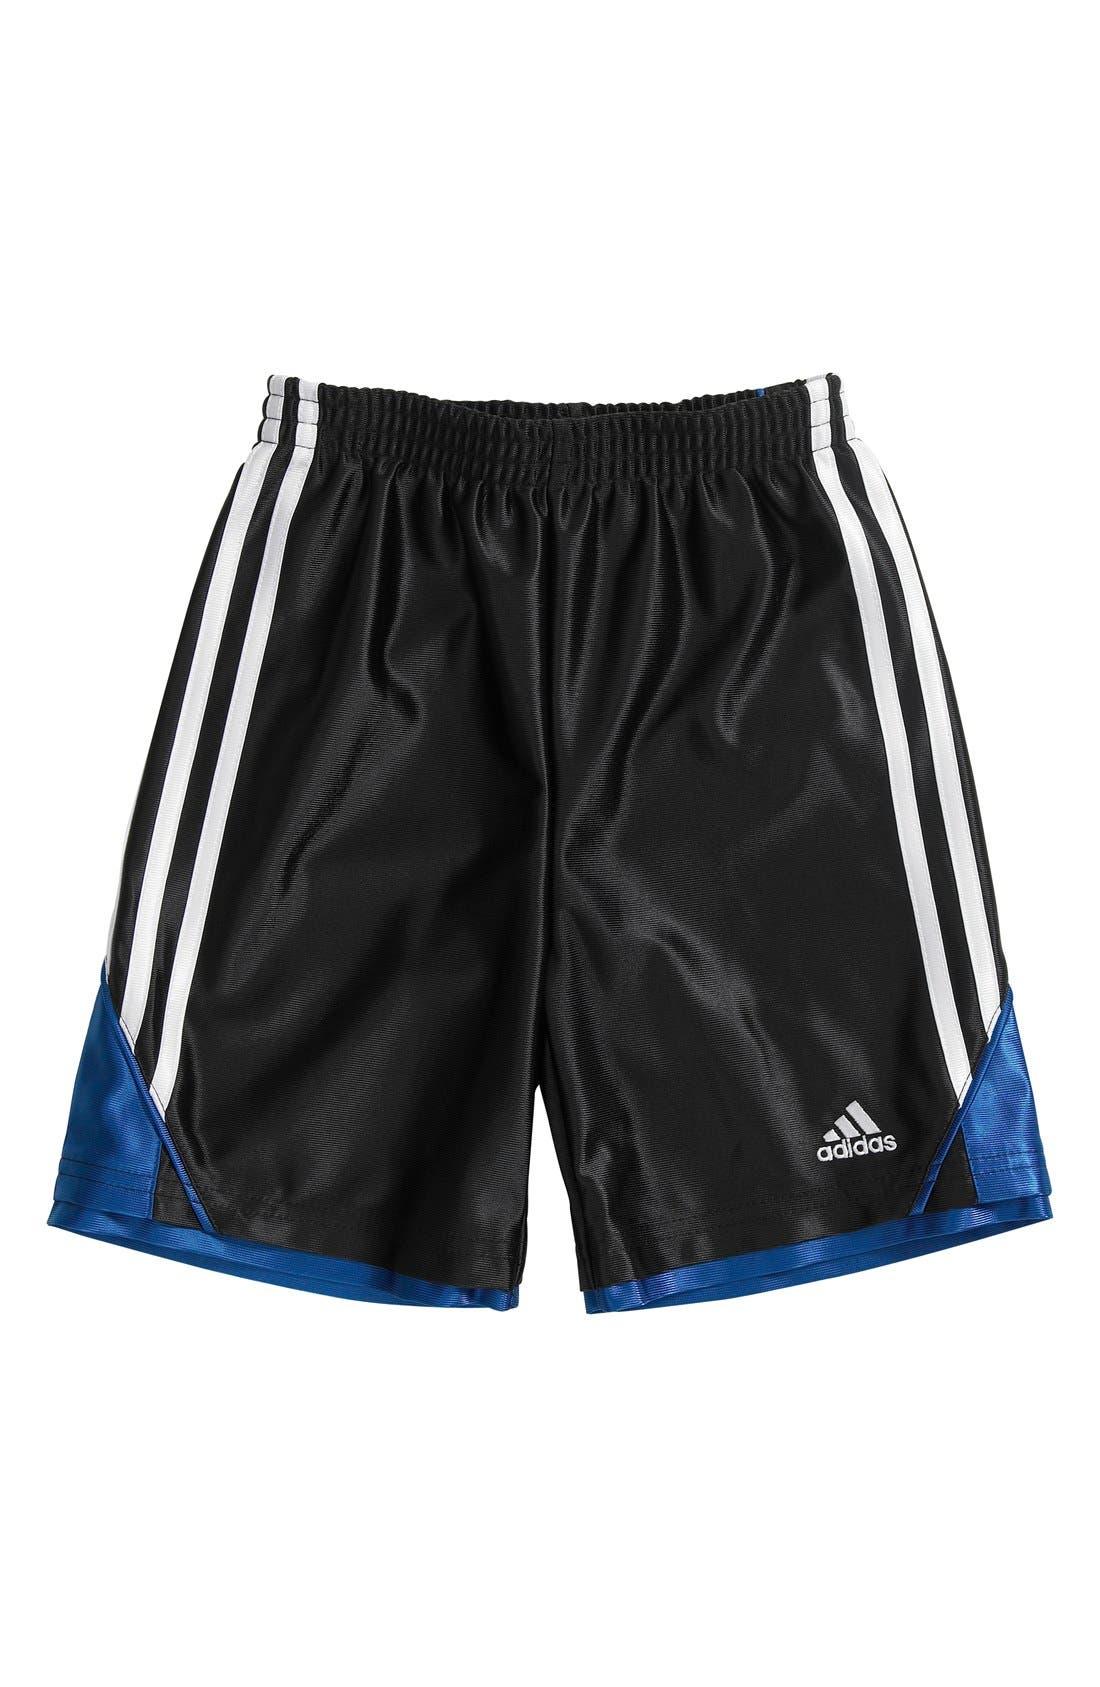 Alternate Image 1 Selected - adidas 'Prime Dazzle' Shorts (Toddler Boys)